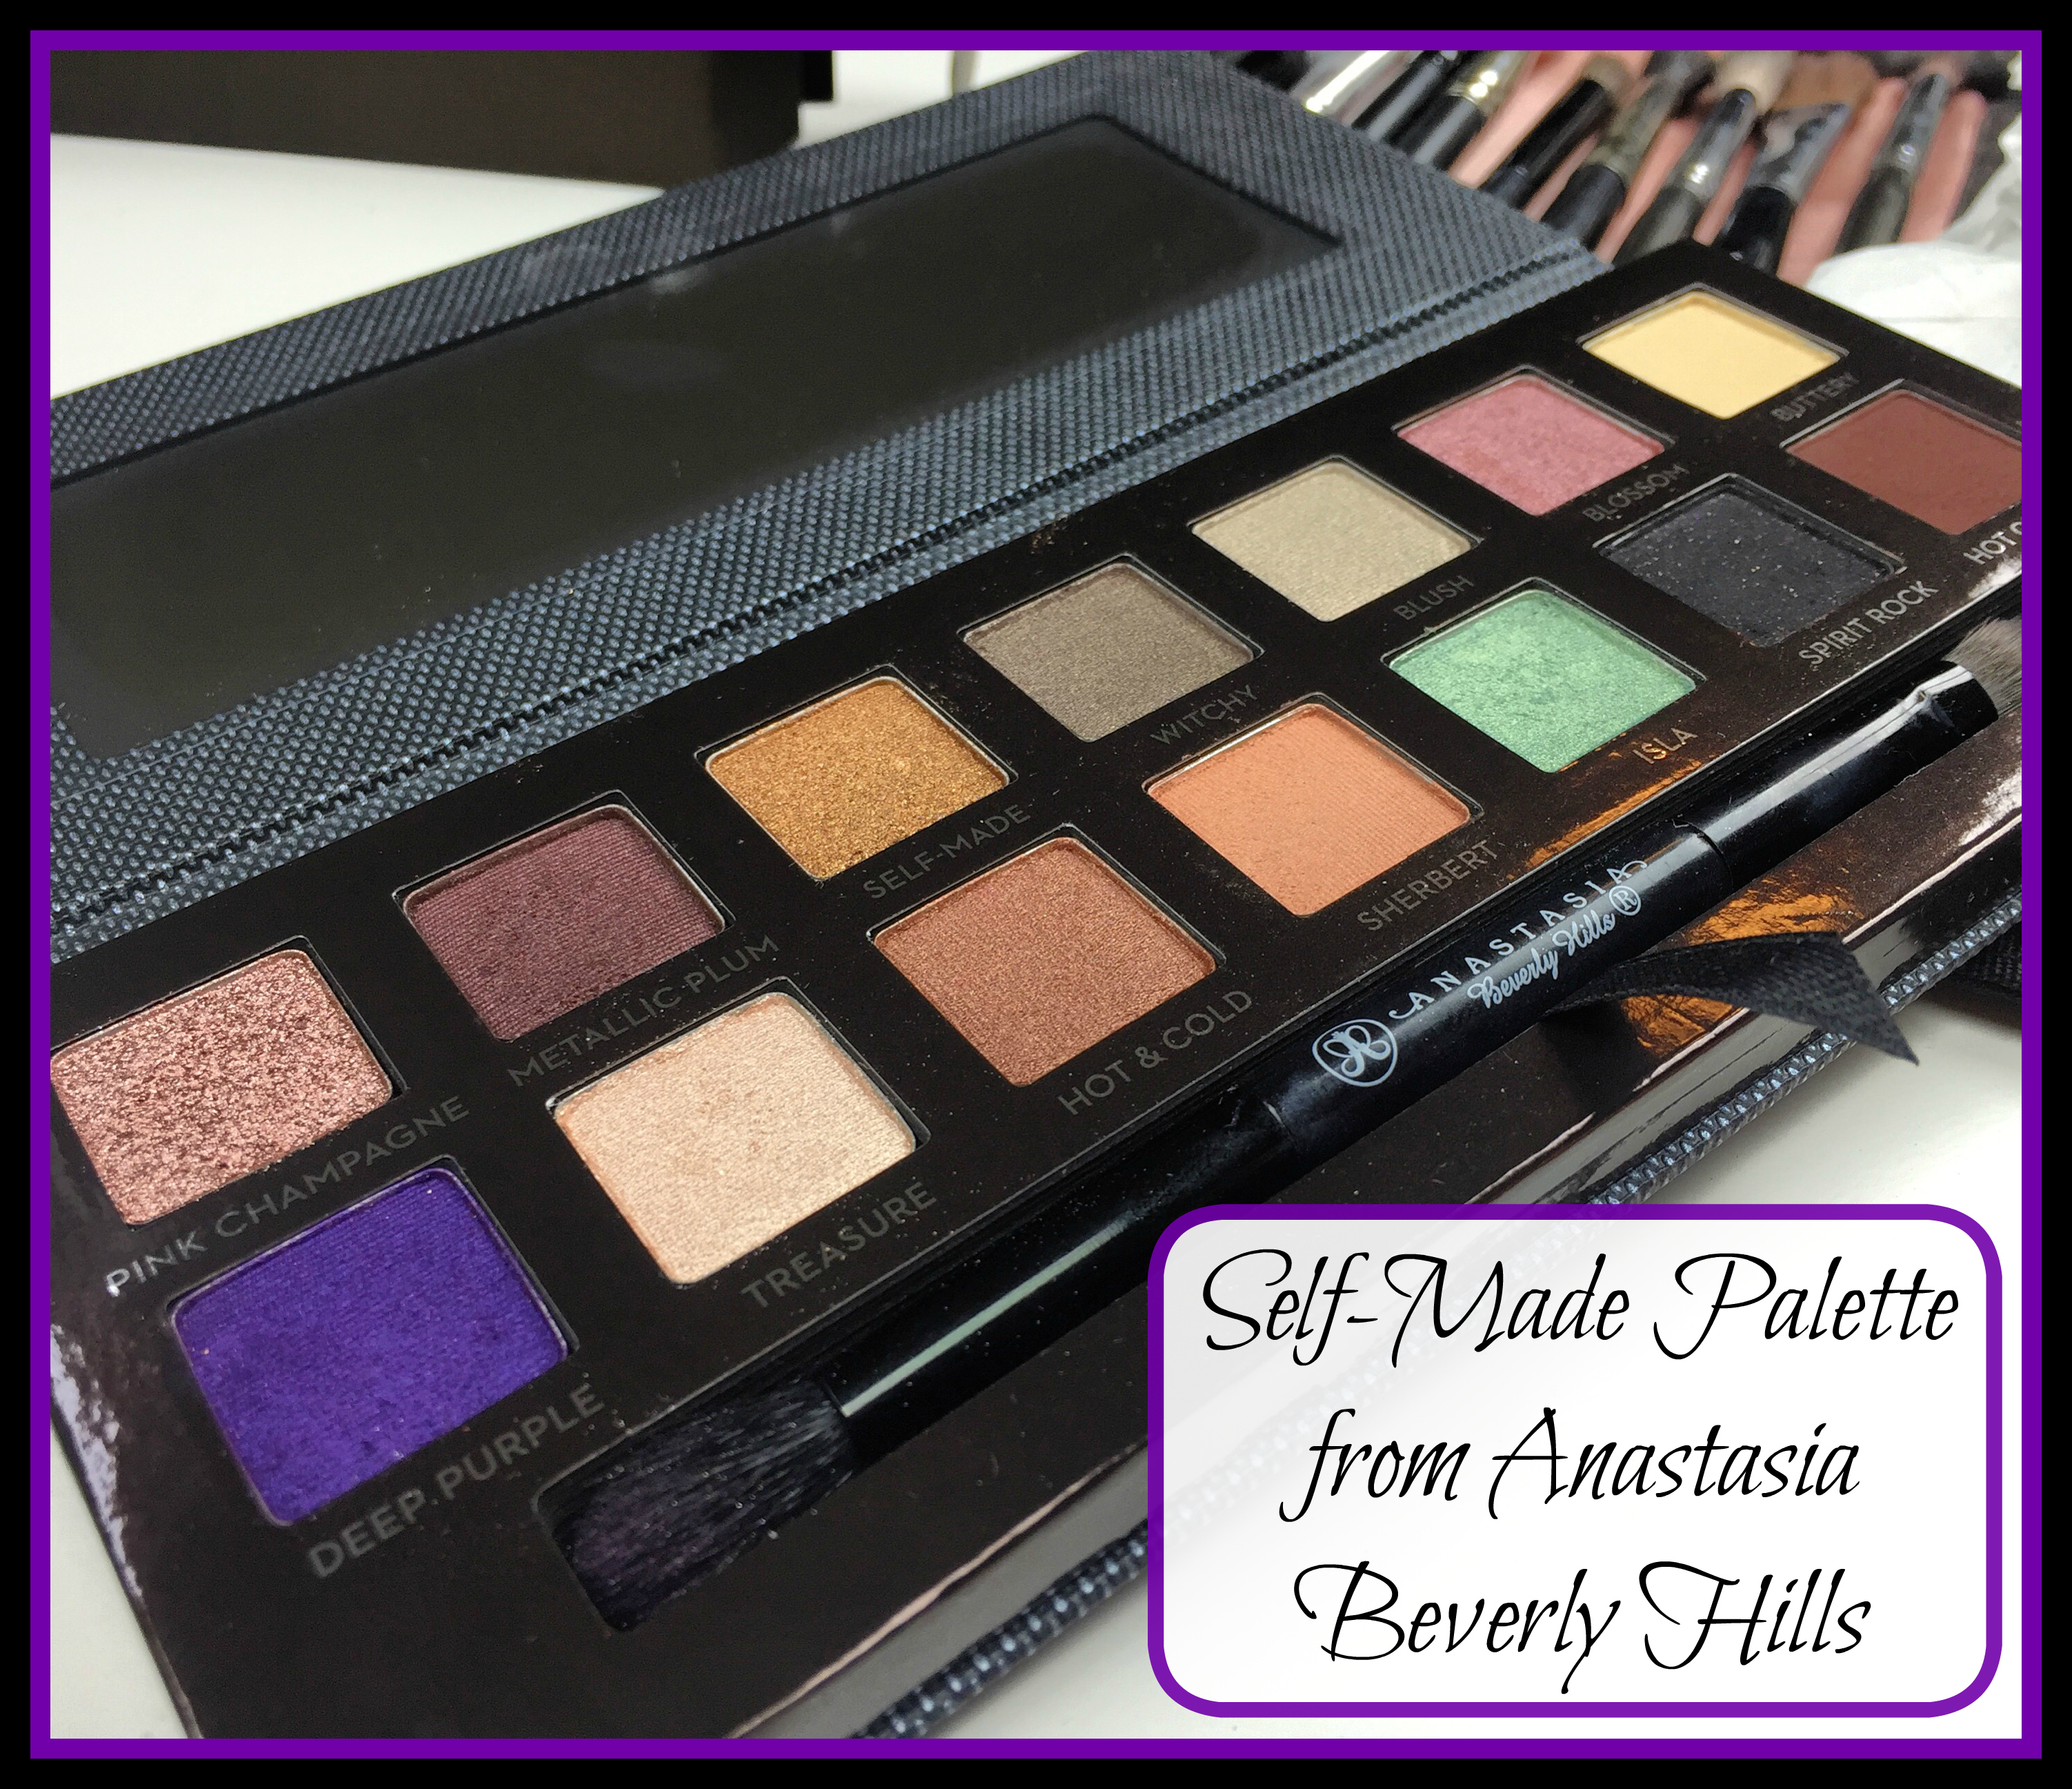 #Anastasia #Sephora #makeup #beauty #bblogger #bbloggers